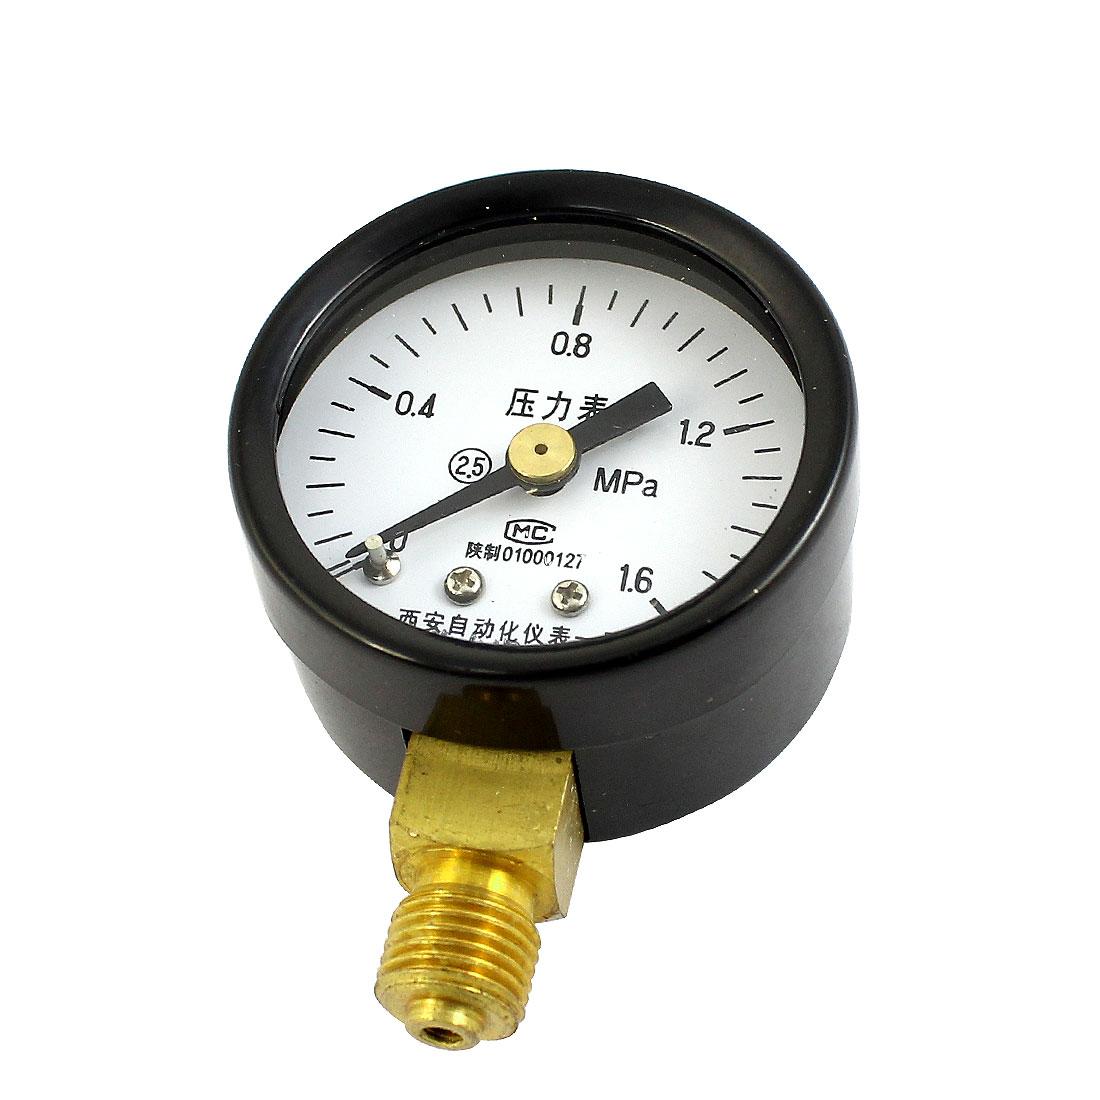 Black Shell 1/8PT Male Threaded 0-1.6Mpa Pneumatic Air Pressure Gauge